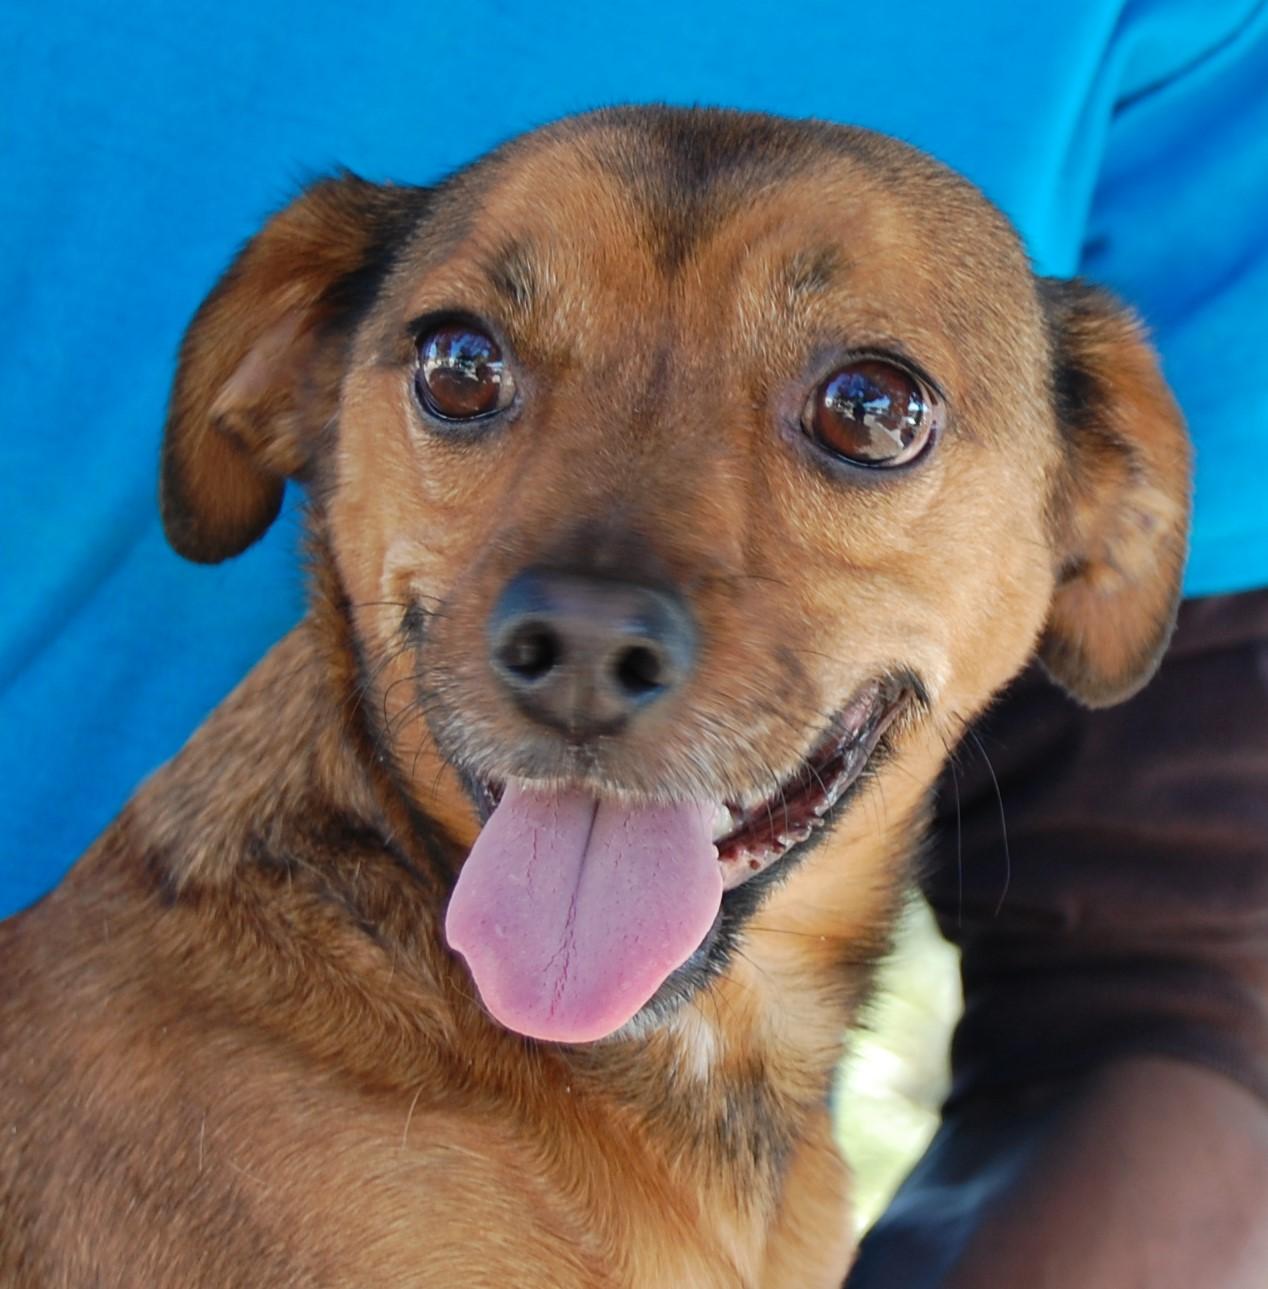 Dog Pound Las Vegas Nevada Nevada Spca Animal Rescue Willoughby